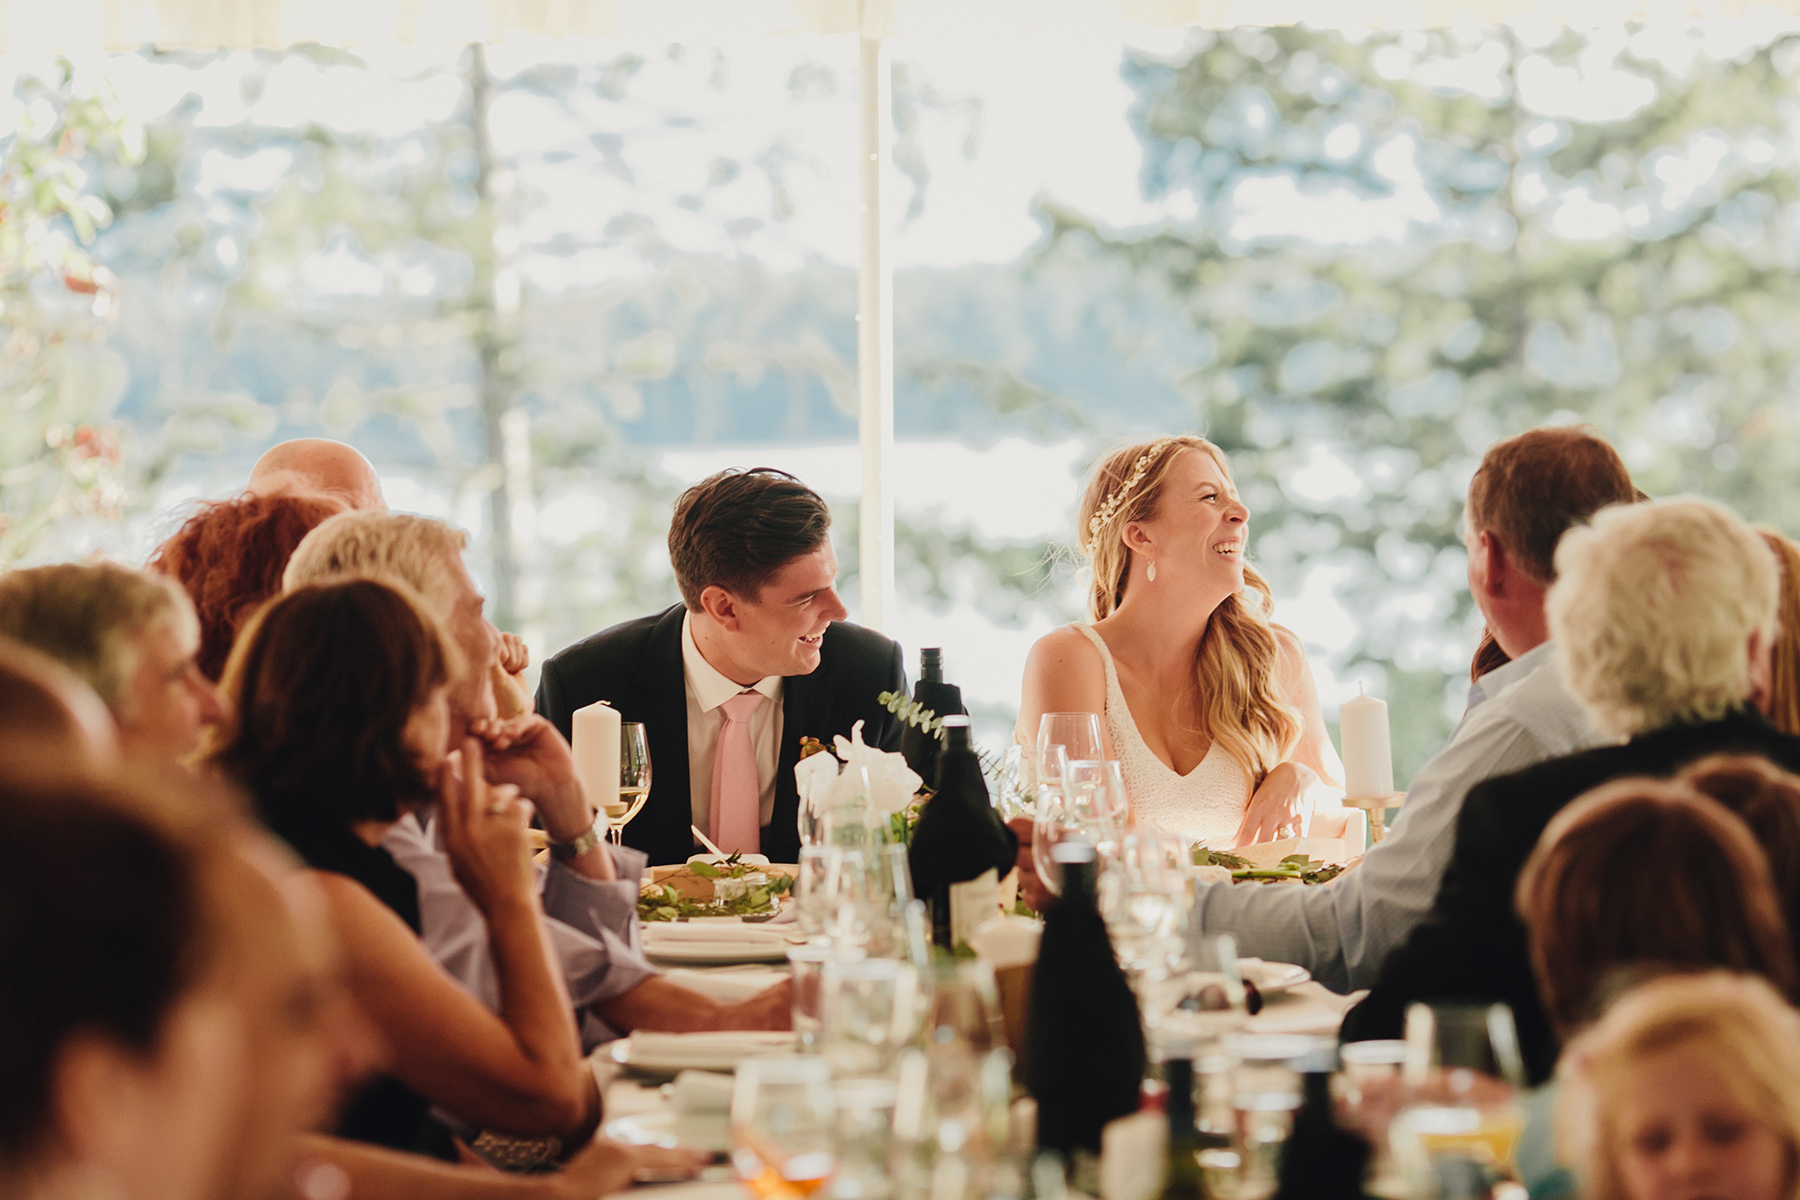 galiano-island-bodega-destination-wedding-0086.JPG